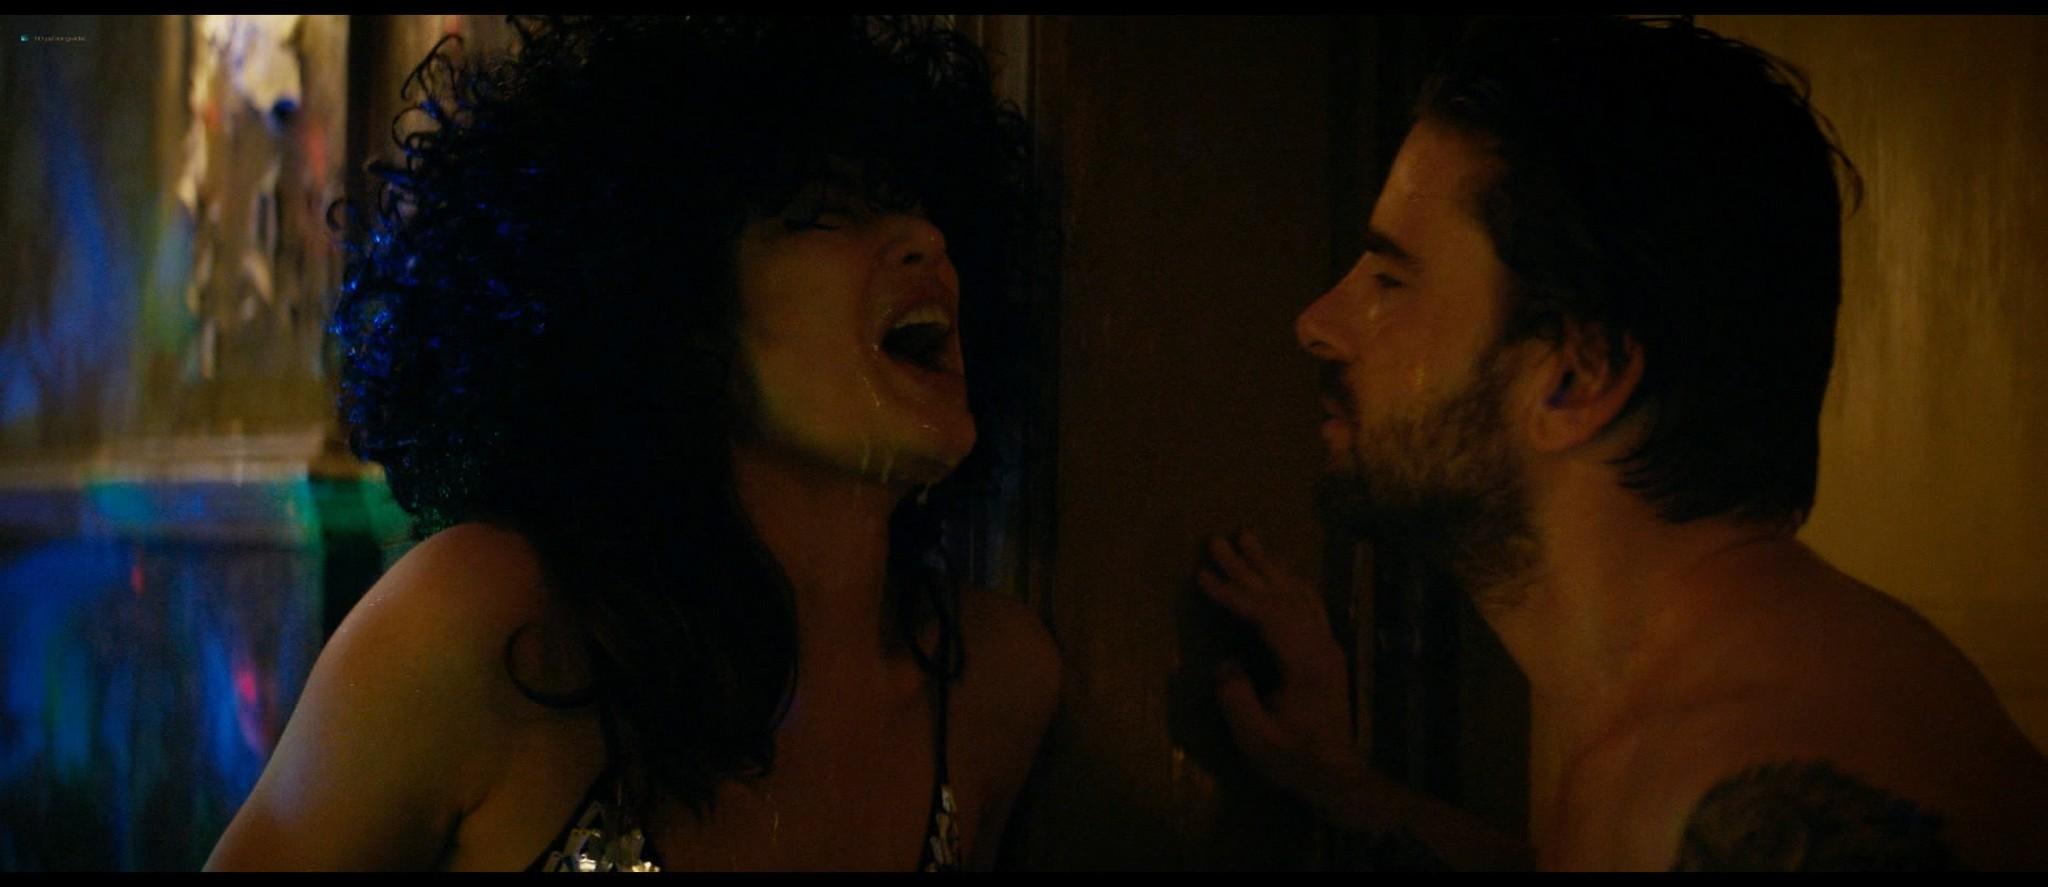 Olga Kurylenko hot and sexy in The Room (2019) HD 1080p BluRay (5)